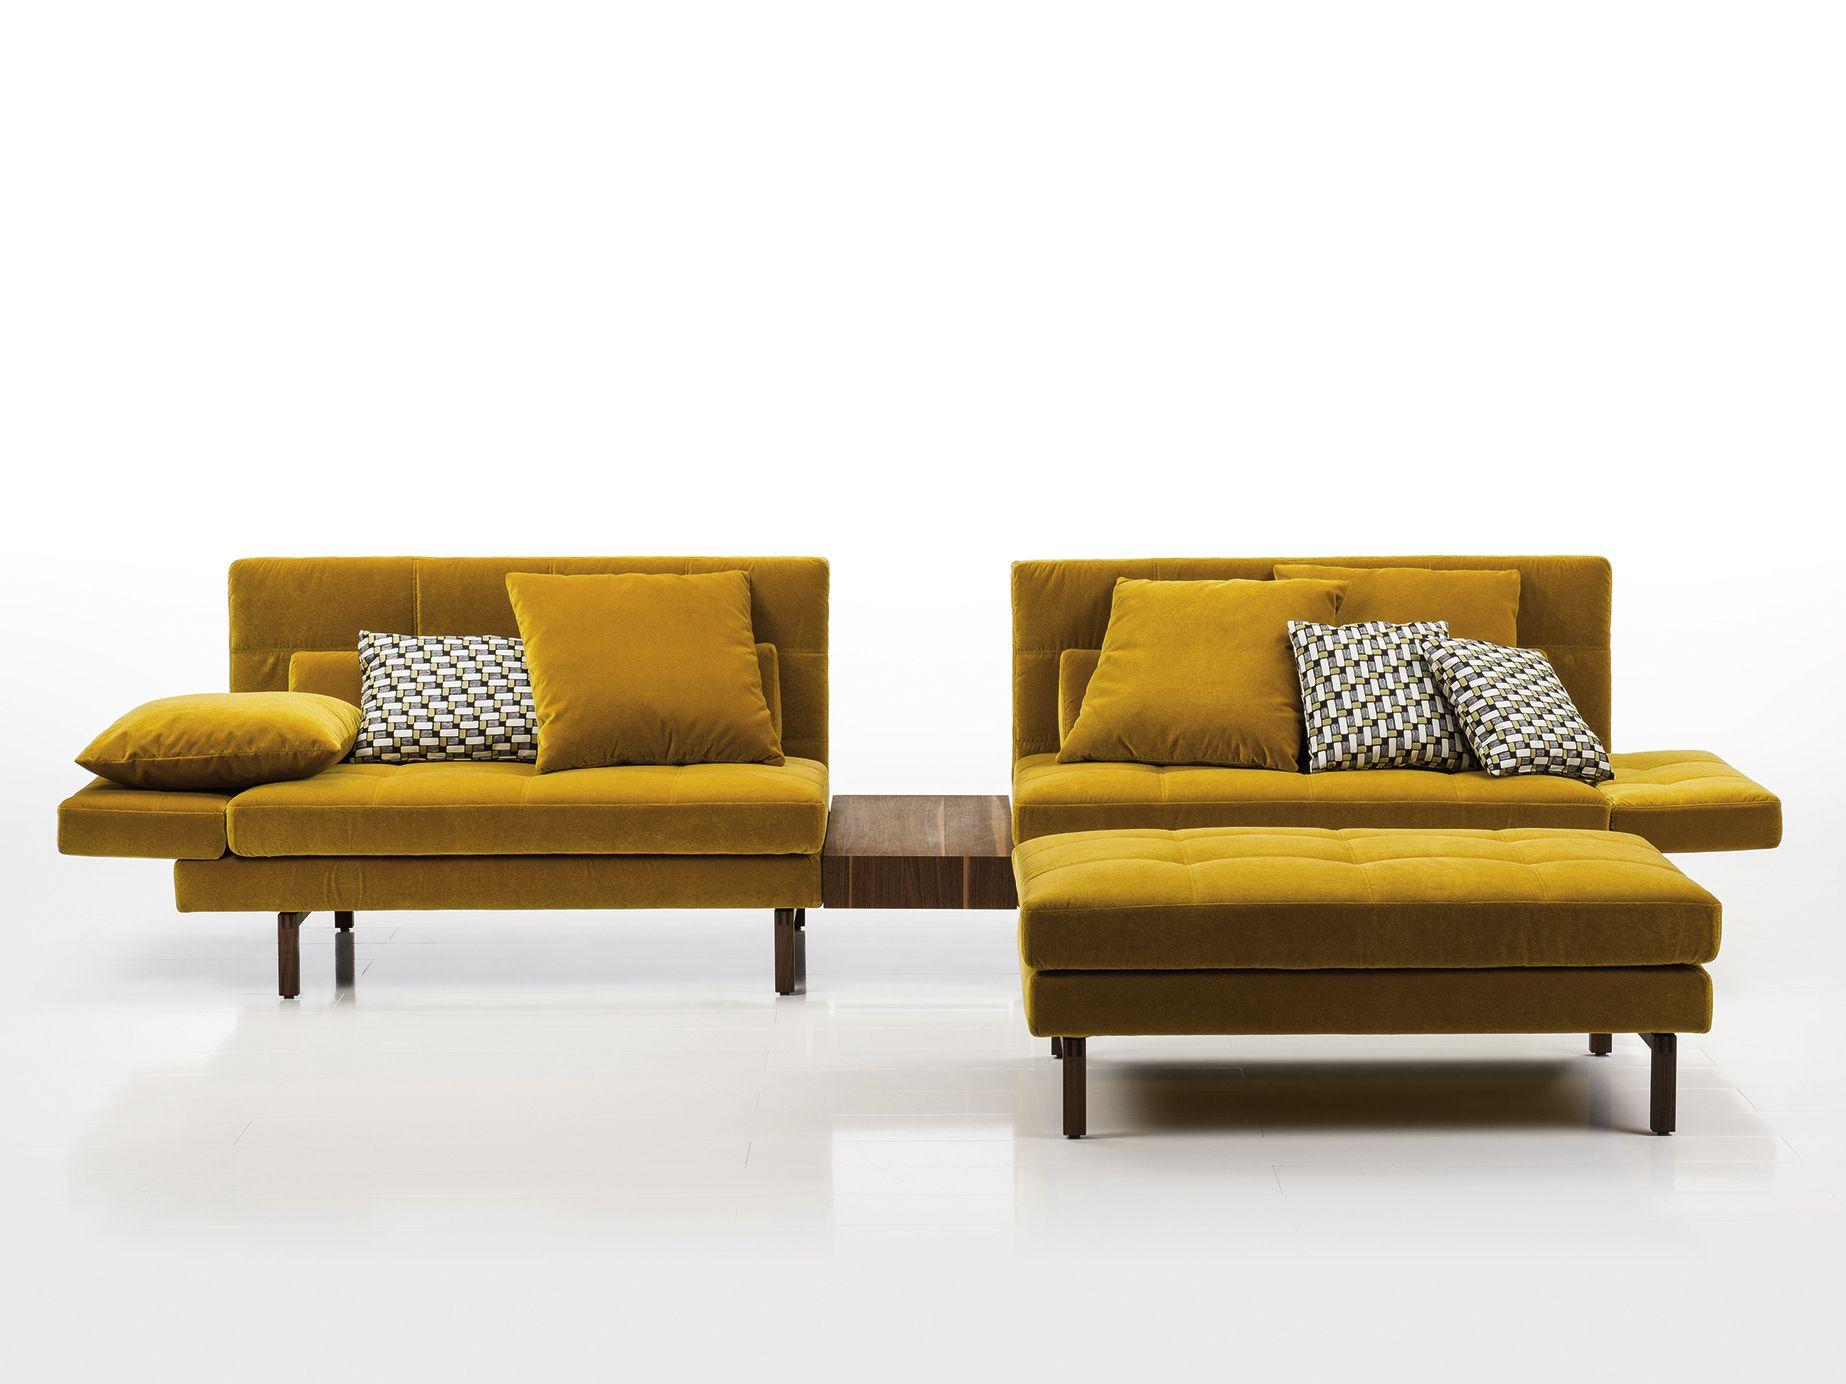 Beeindruckend Brühl Und Sippold Galerie Von Sectional Fabric Sofa Amber | Fabric Sofa